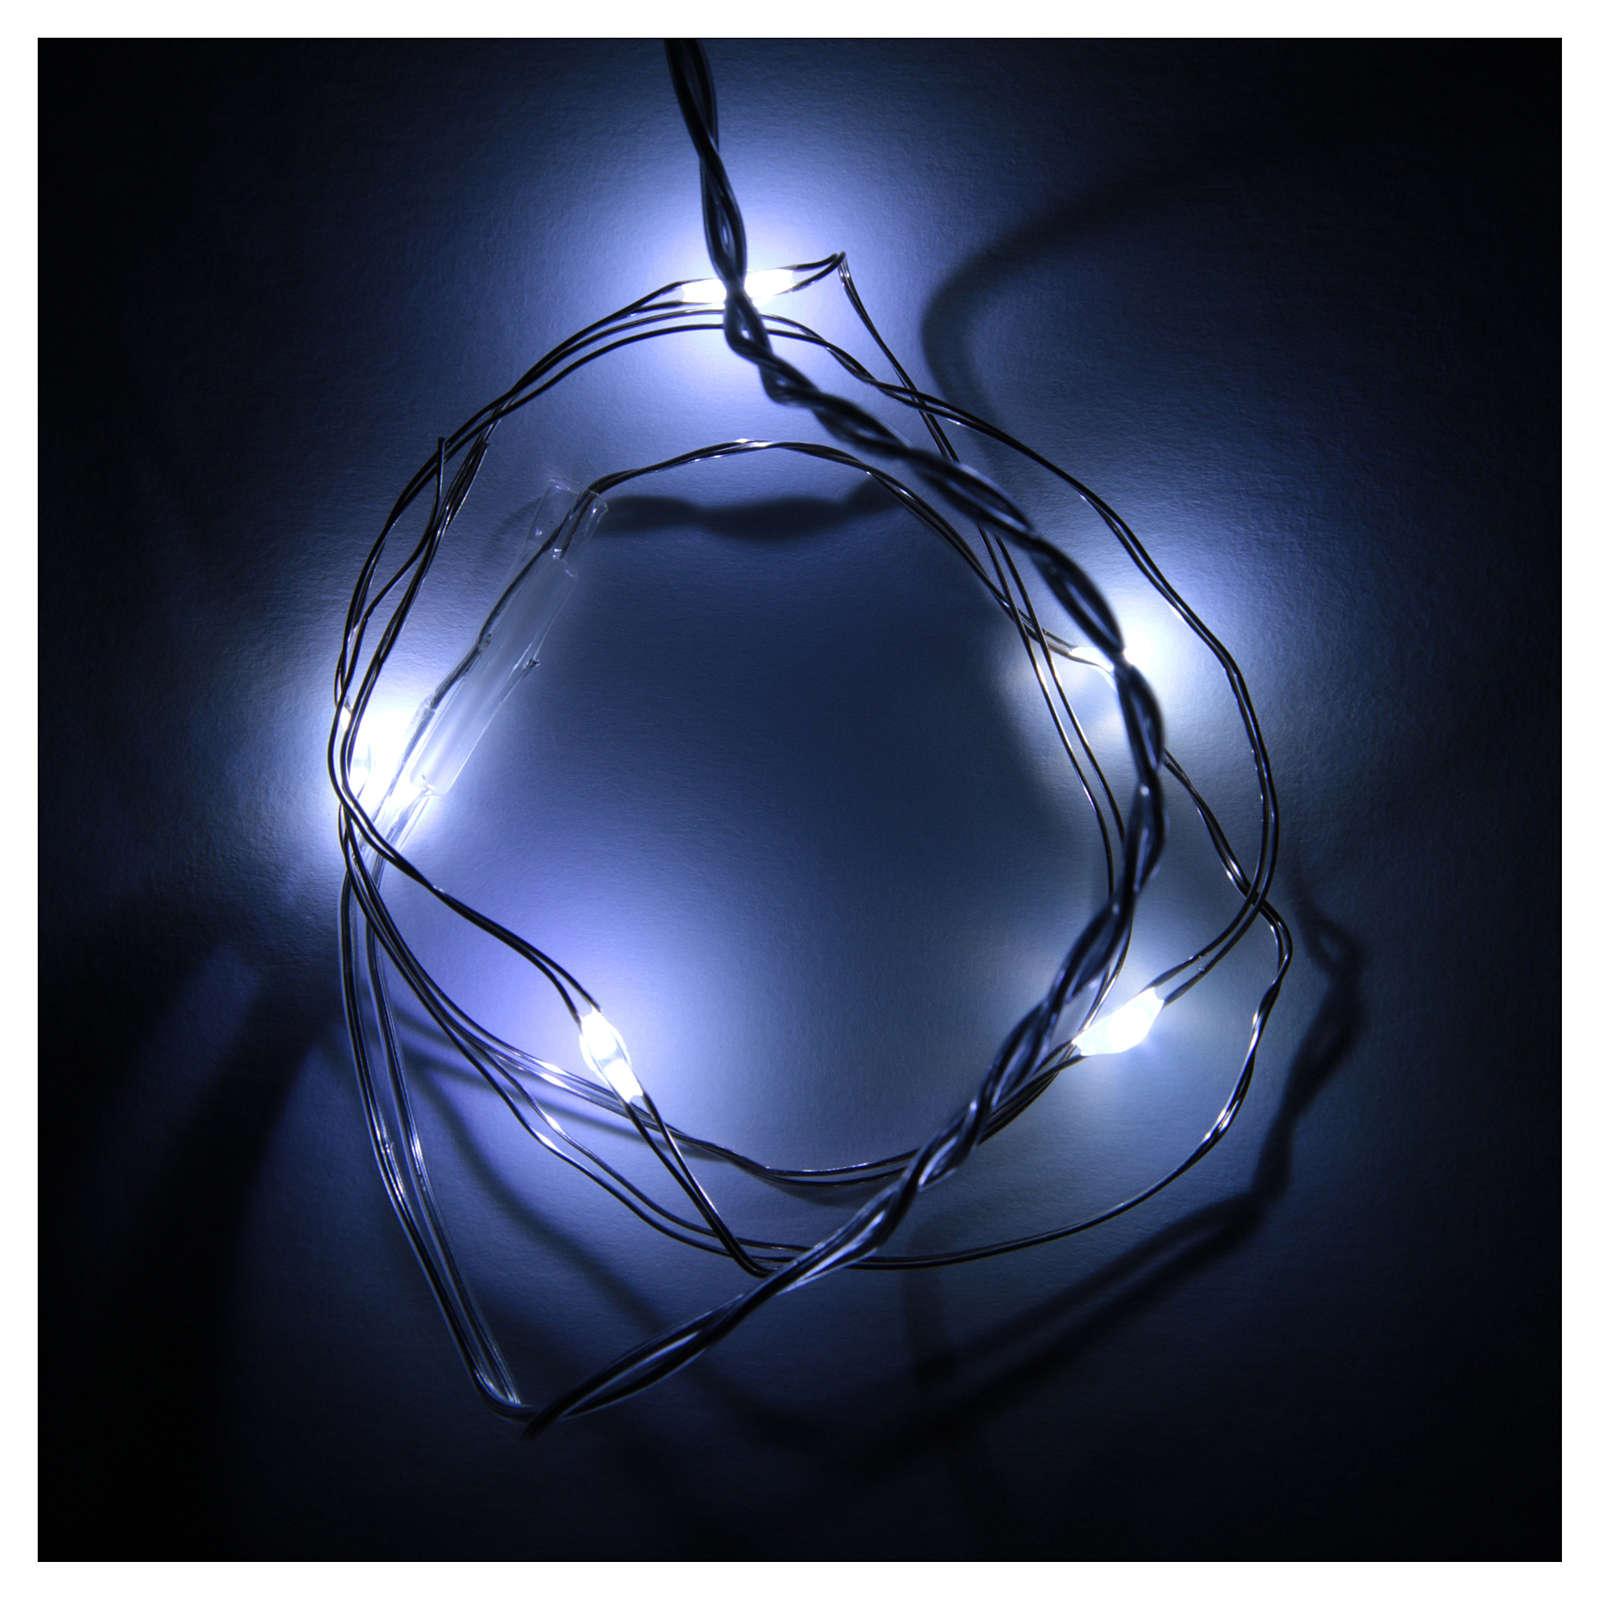 Luce di Natale 5 luci led a goccia bianca fredda a batteria filo nudo 3